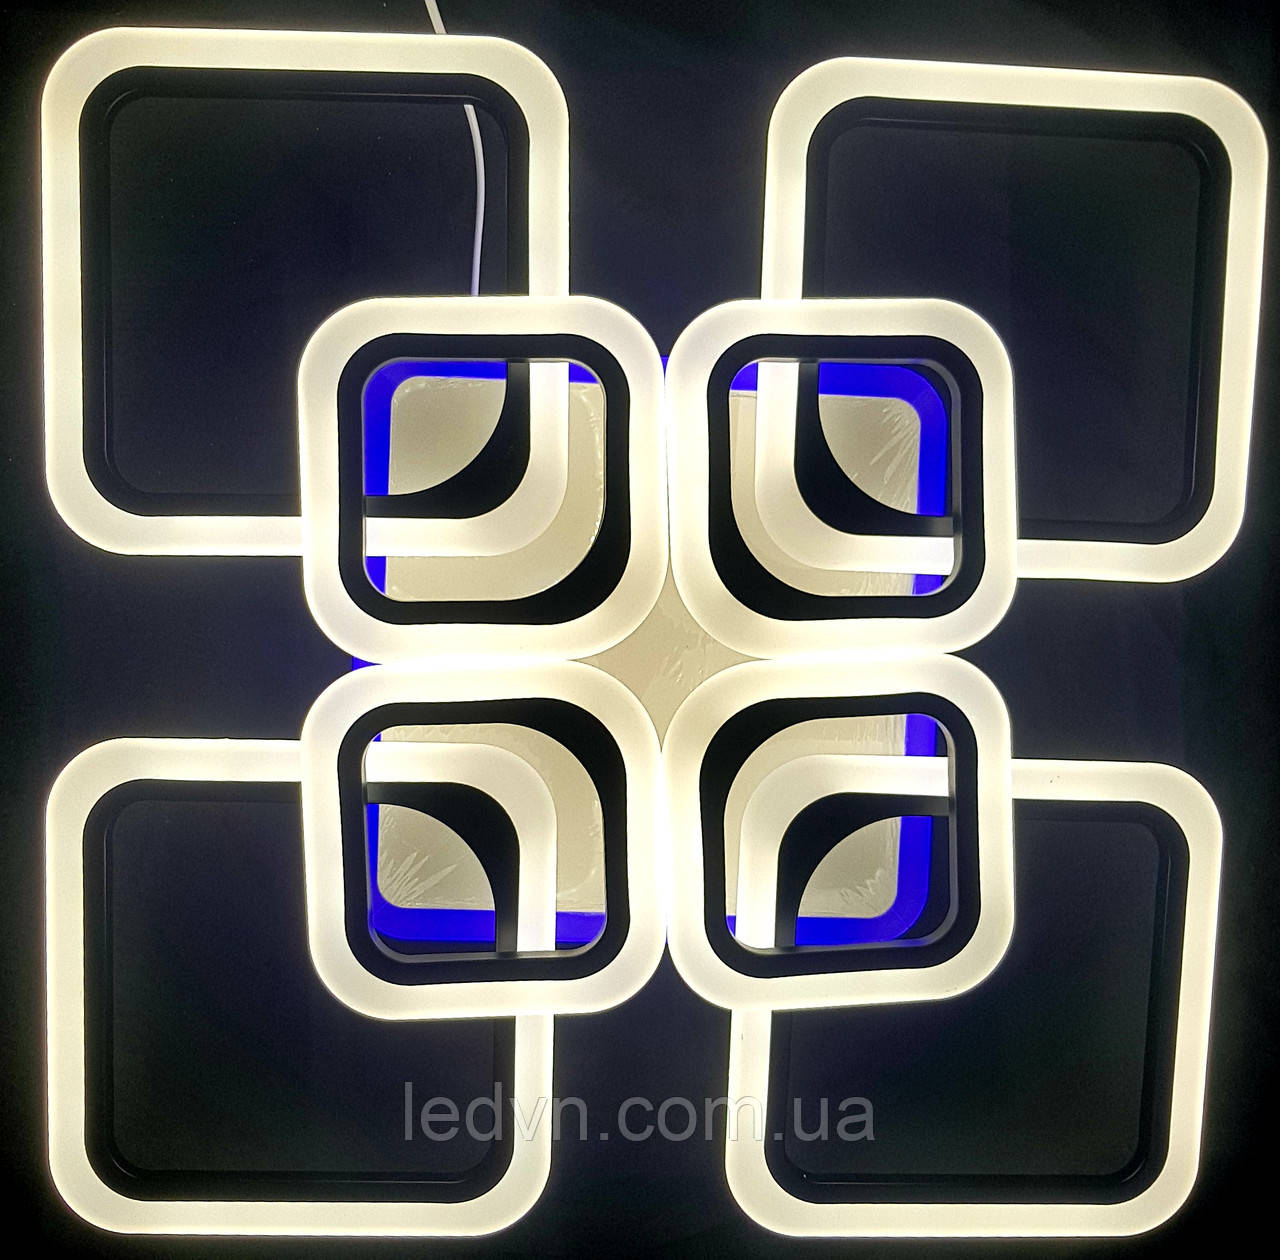 Светодиодная люстра 4+4 квадрата диммер+синий led черная